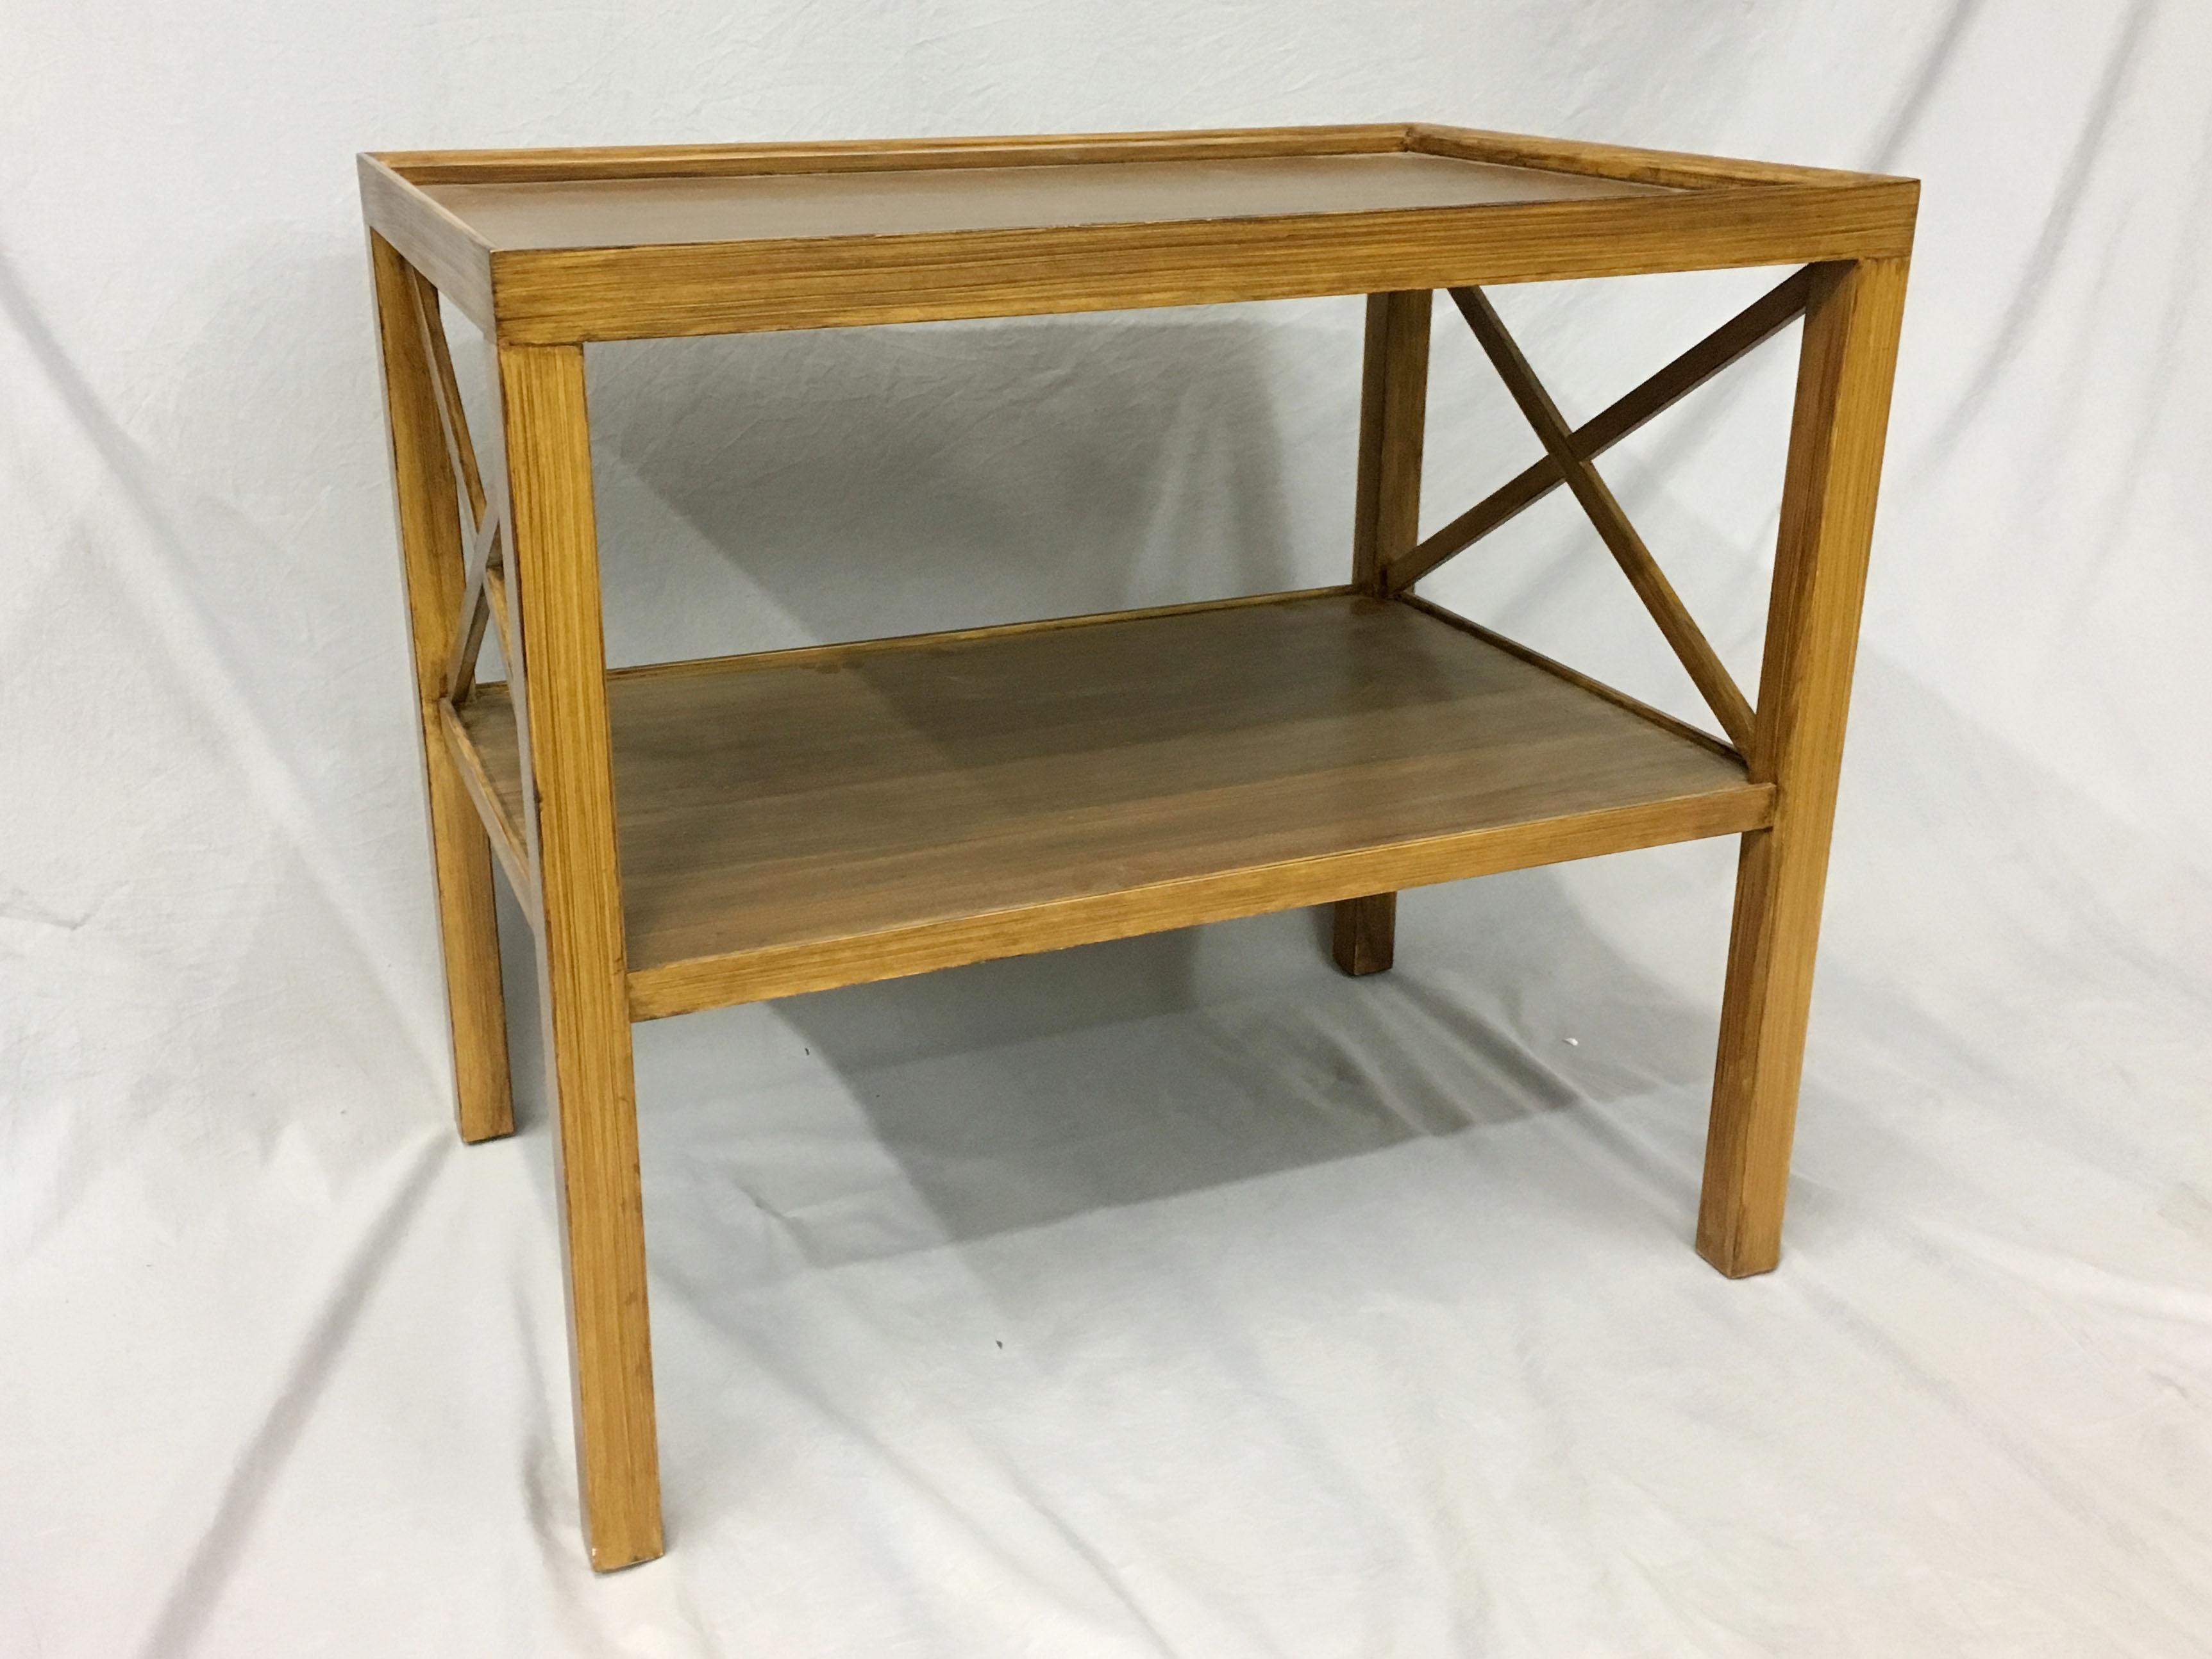 mid century side table with raised edges